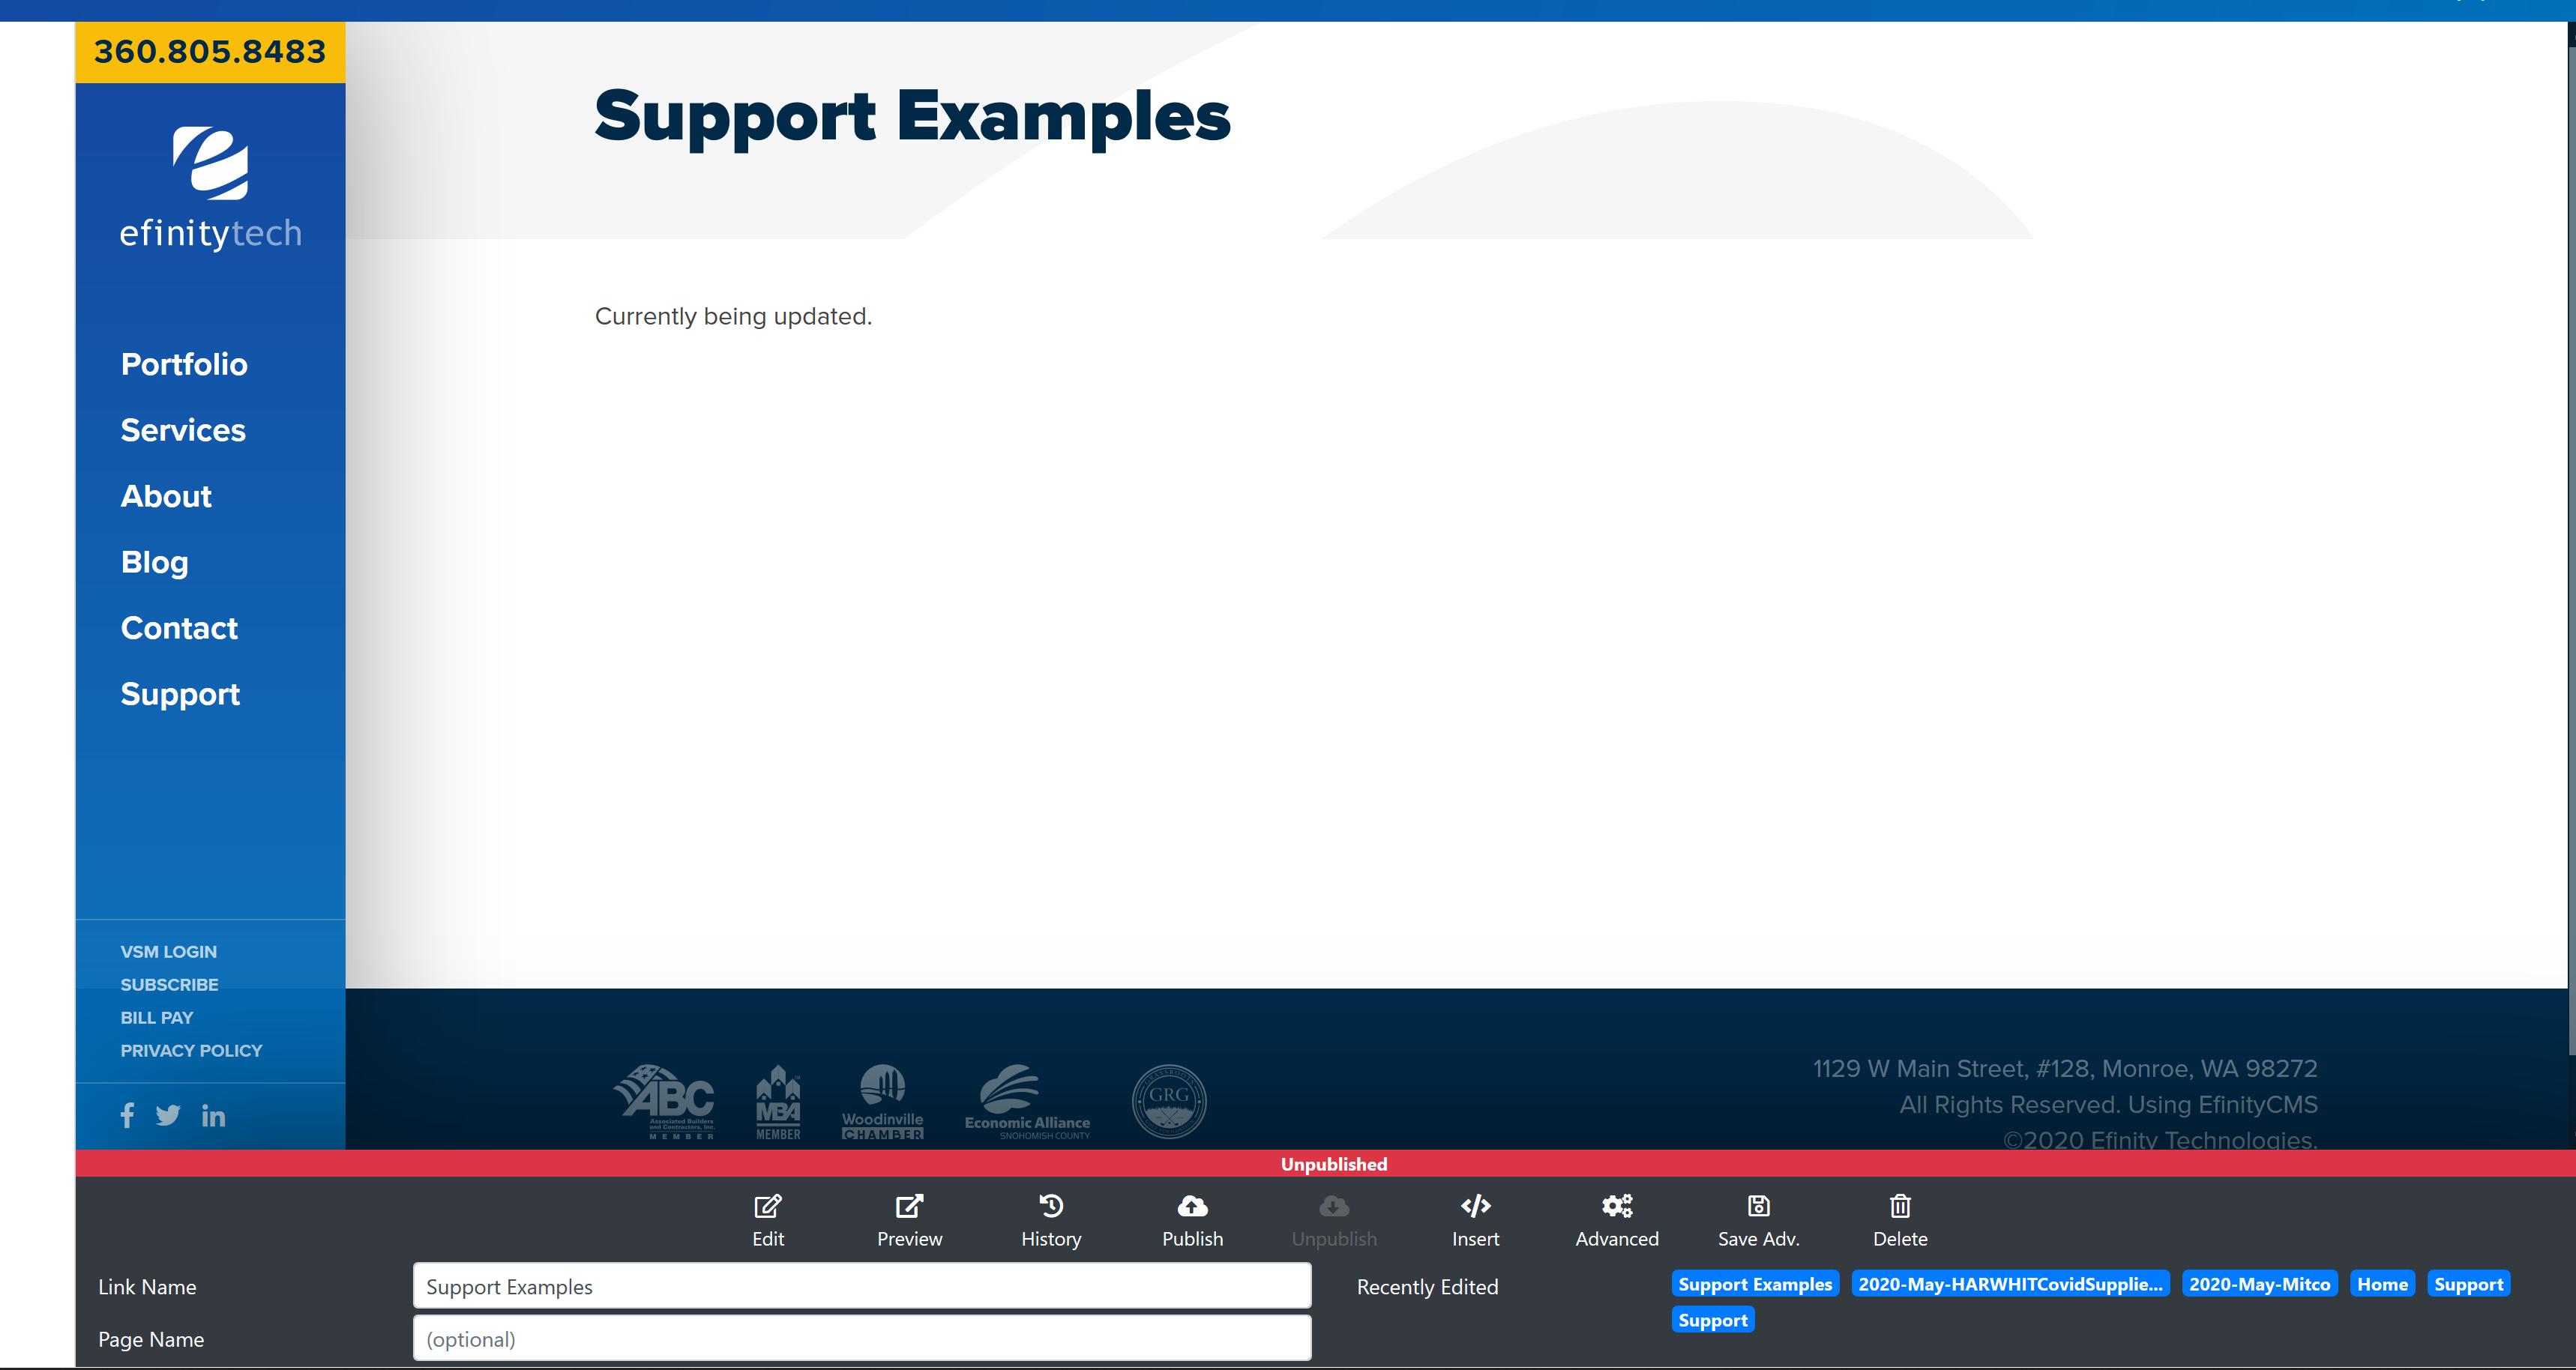 Support Examples Screenshot